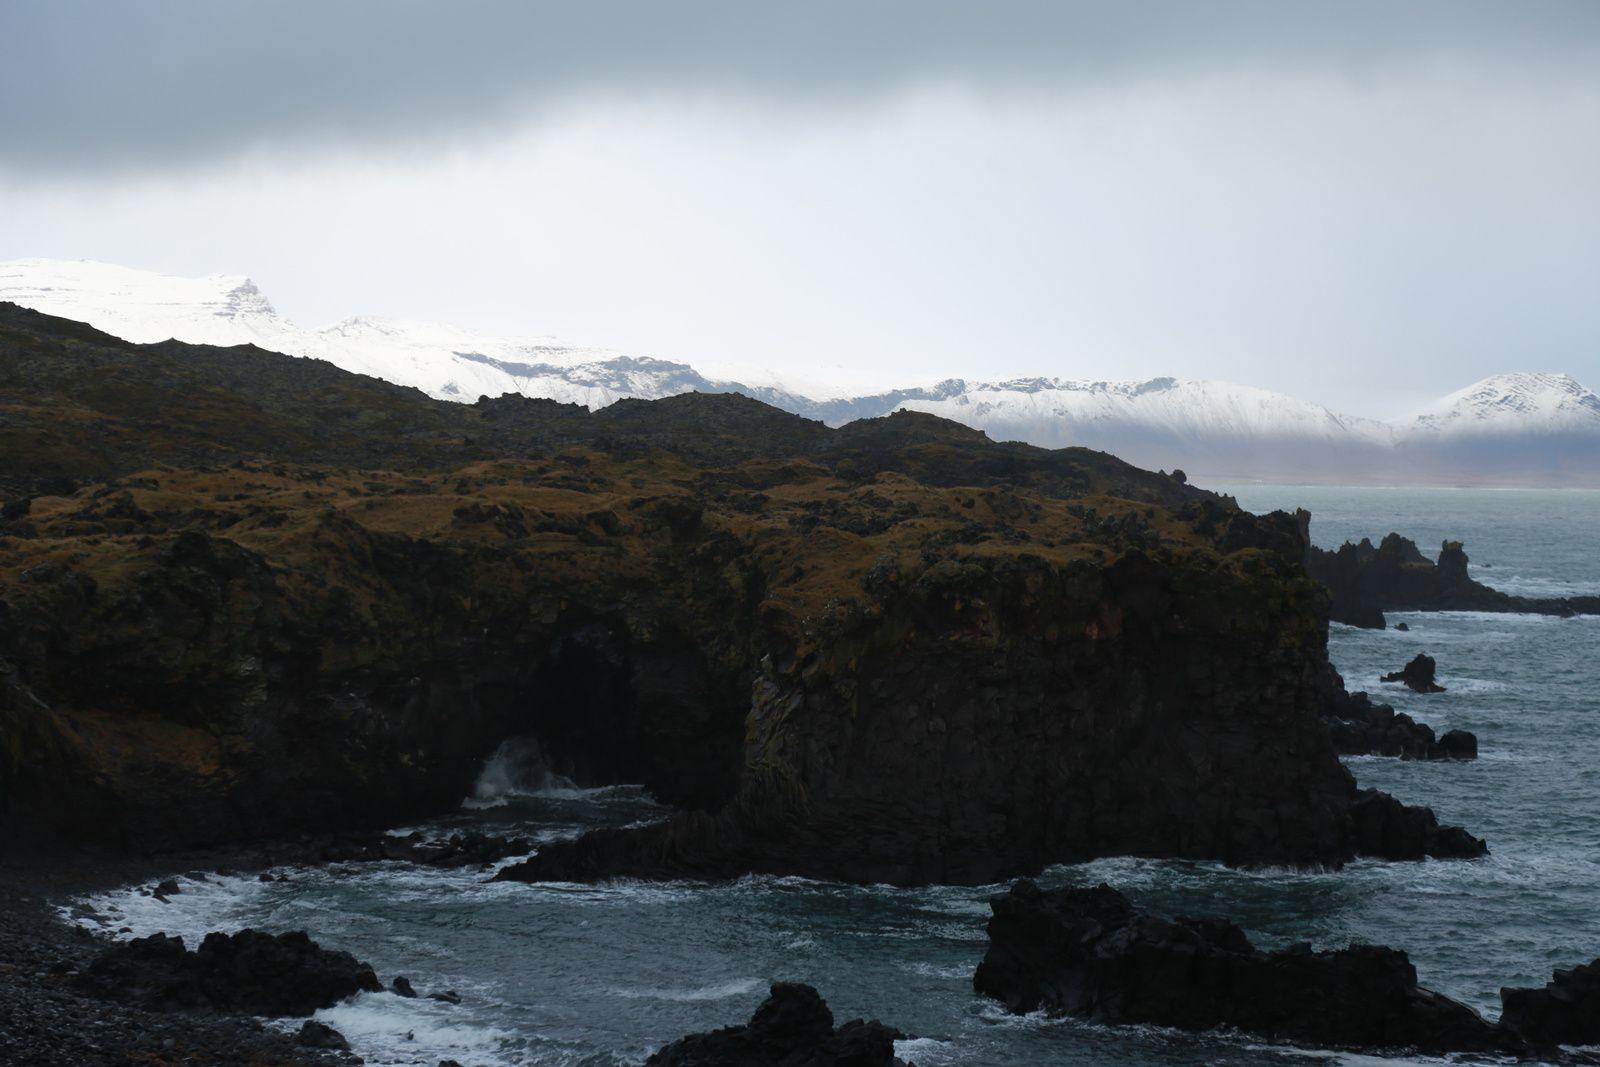 Une coulée du Snaefellsjökull plonge dans la mer près du port d'Arnarstapi - en arrière-plan, le Snaefellsjökull - photos © Bernard Duyck 10.2016